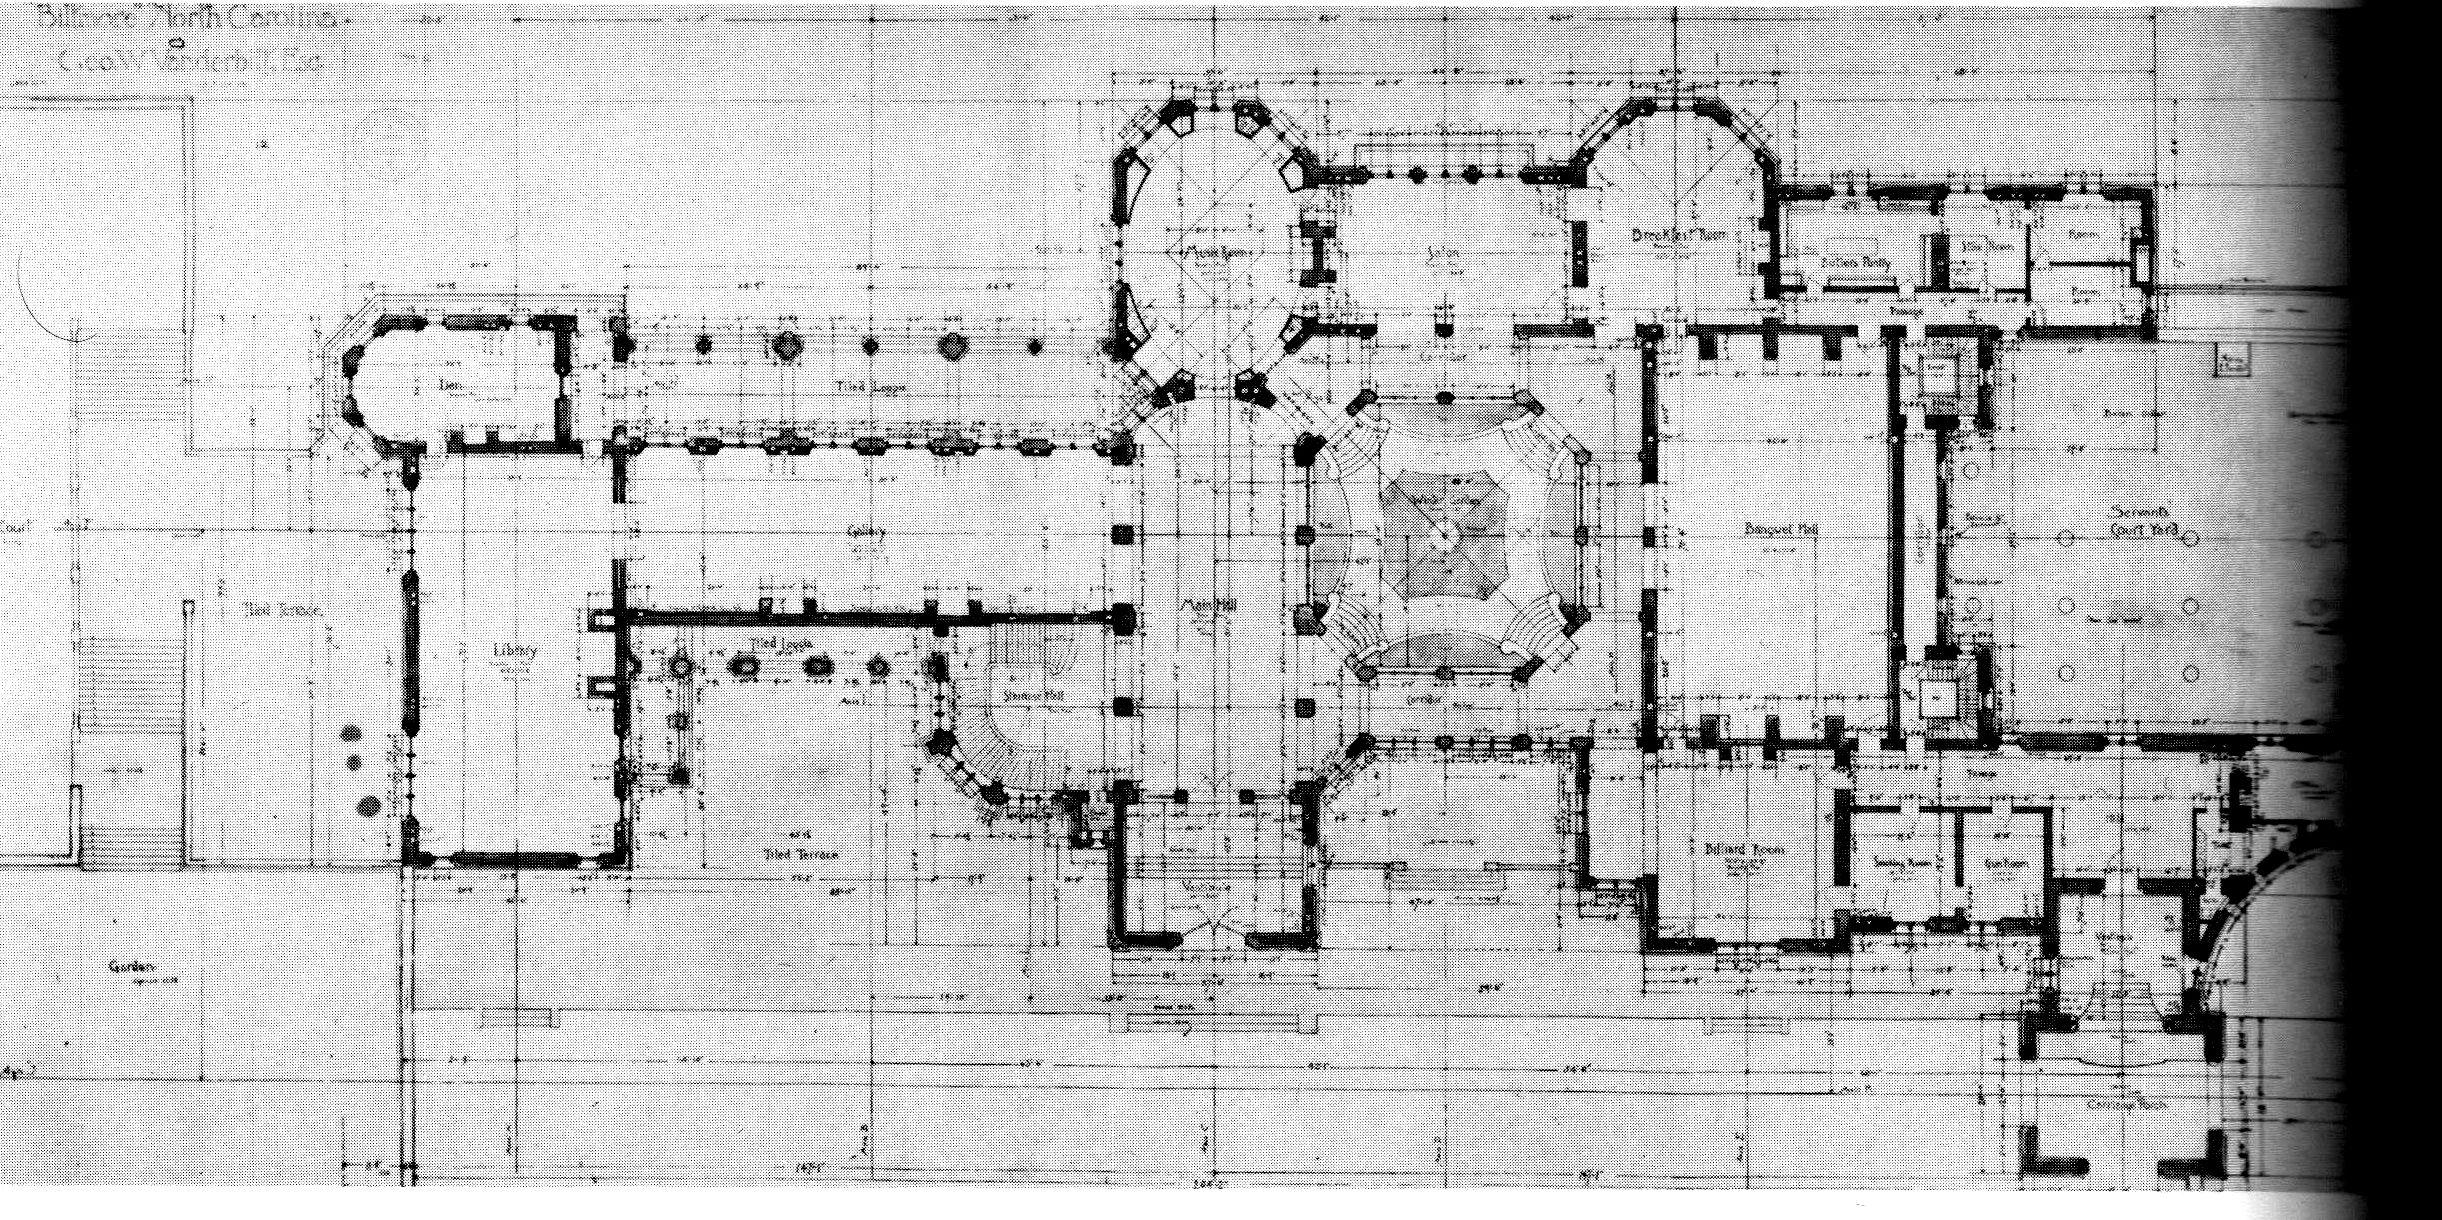 Floor plan scan an american castle the biltmore estate for Biltmore estate floor plan